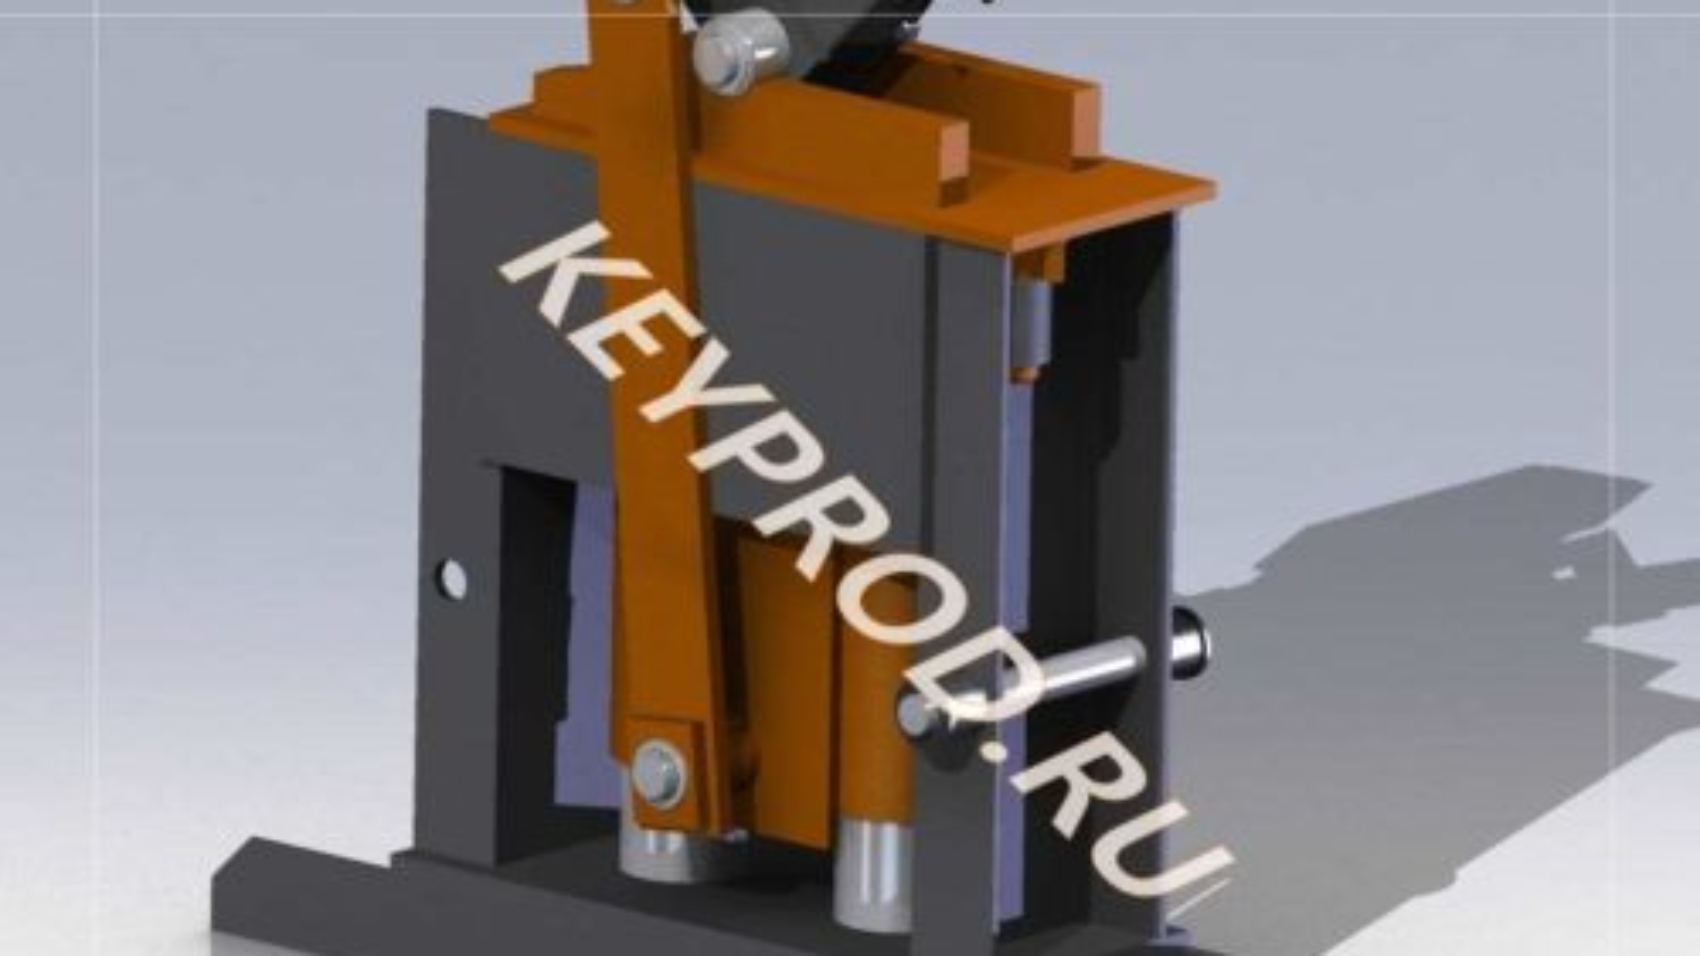 3D Модель Ручного формовочного станка